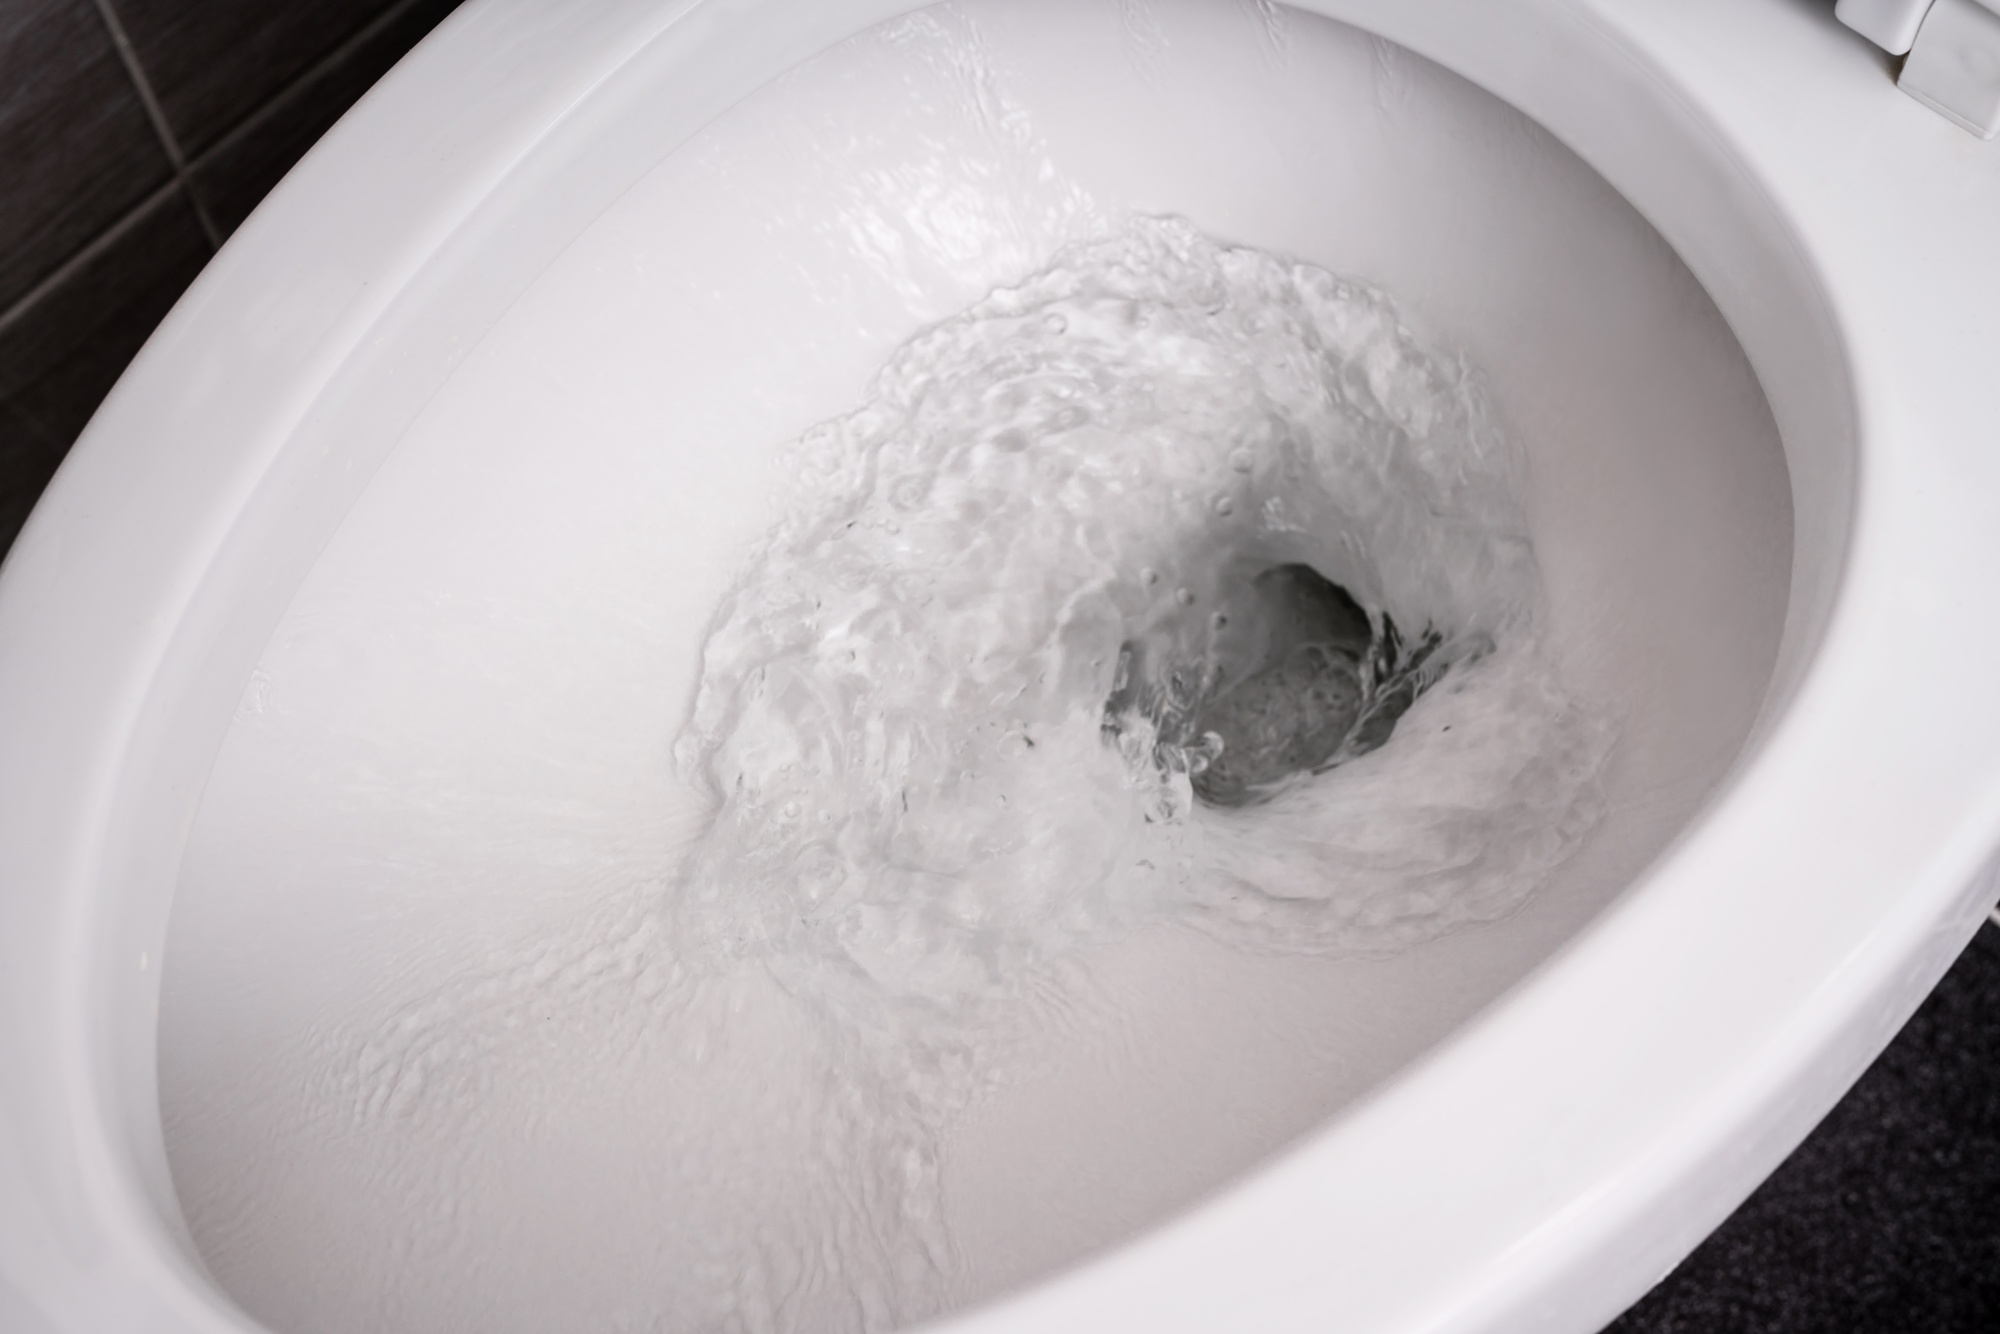 Trump S Toilet Flushing Problem Has Deep Regulatory Roots Bloomberg